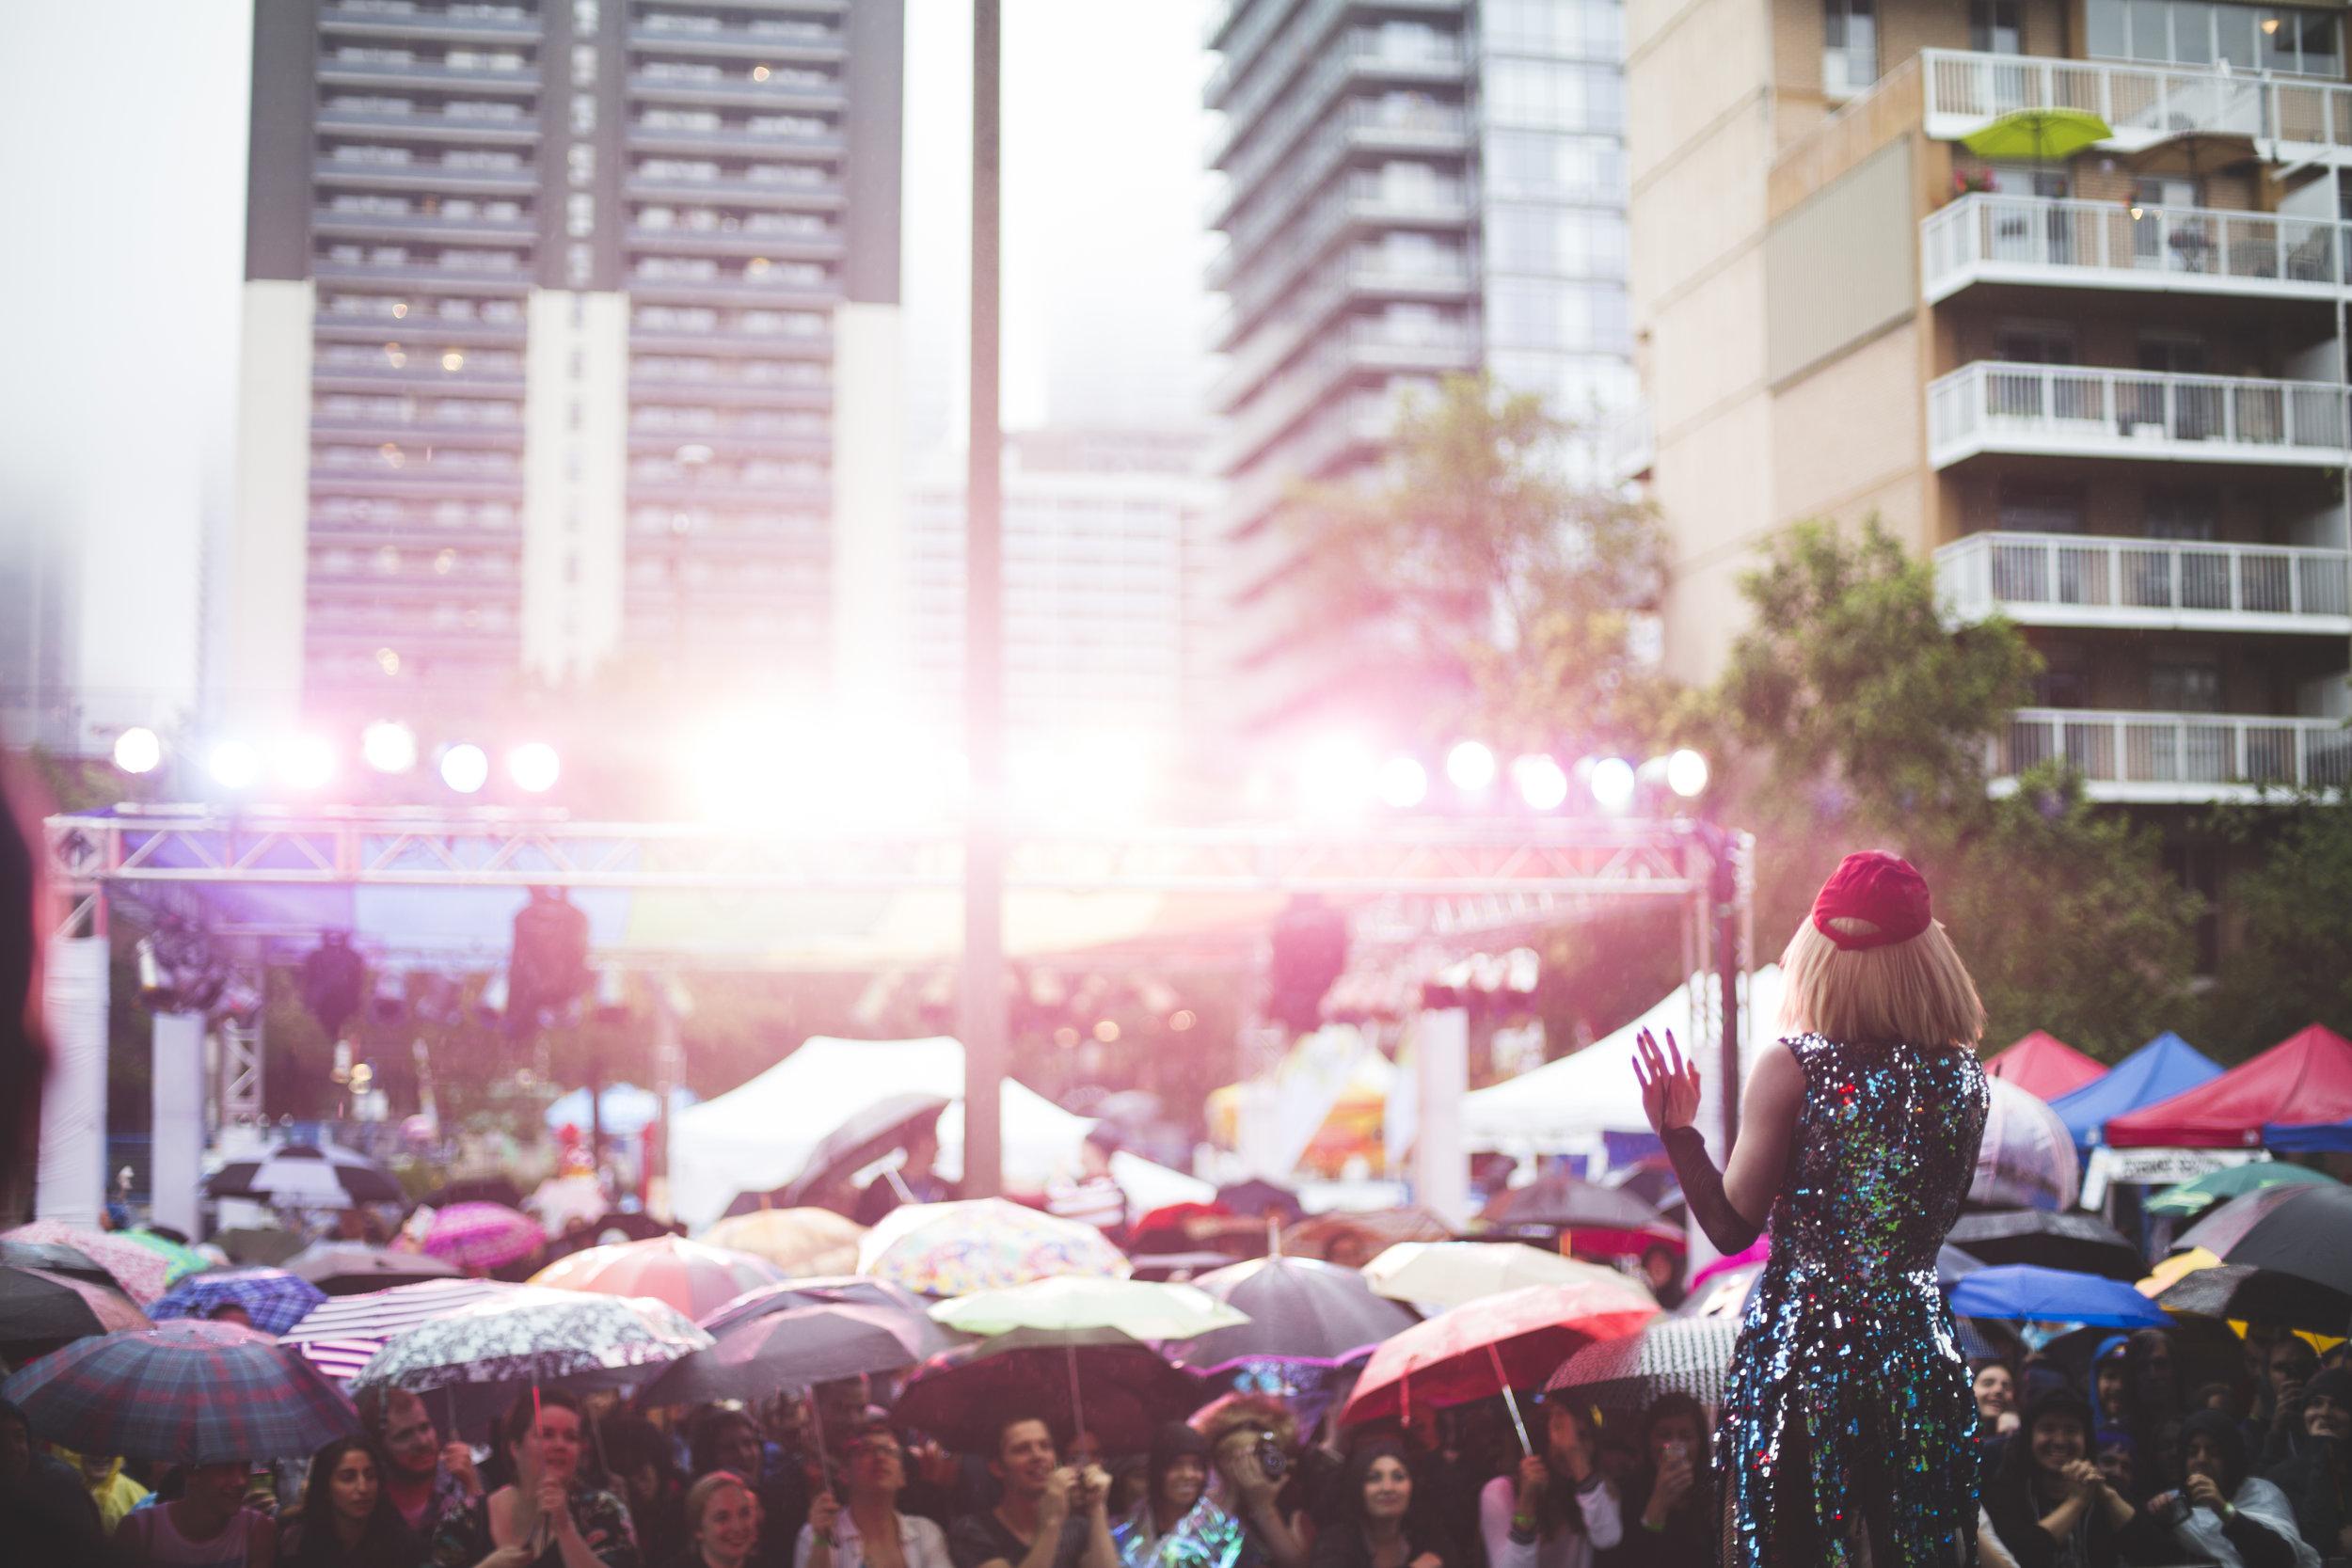 Pride_Toronto_2015_Drag_On_by_Indeana_Underhill-20.jpg